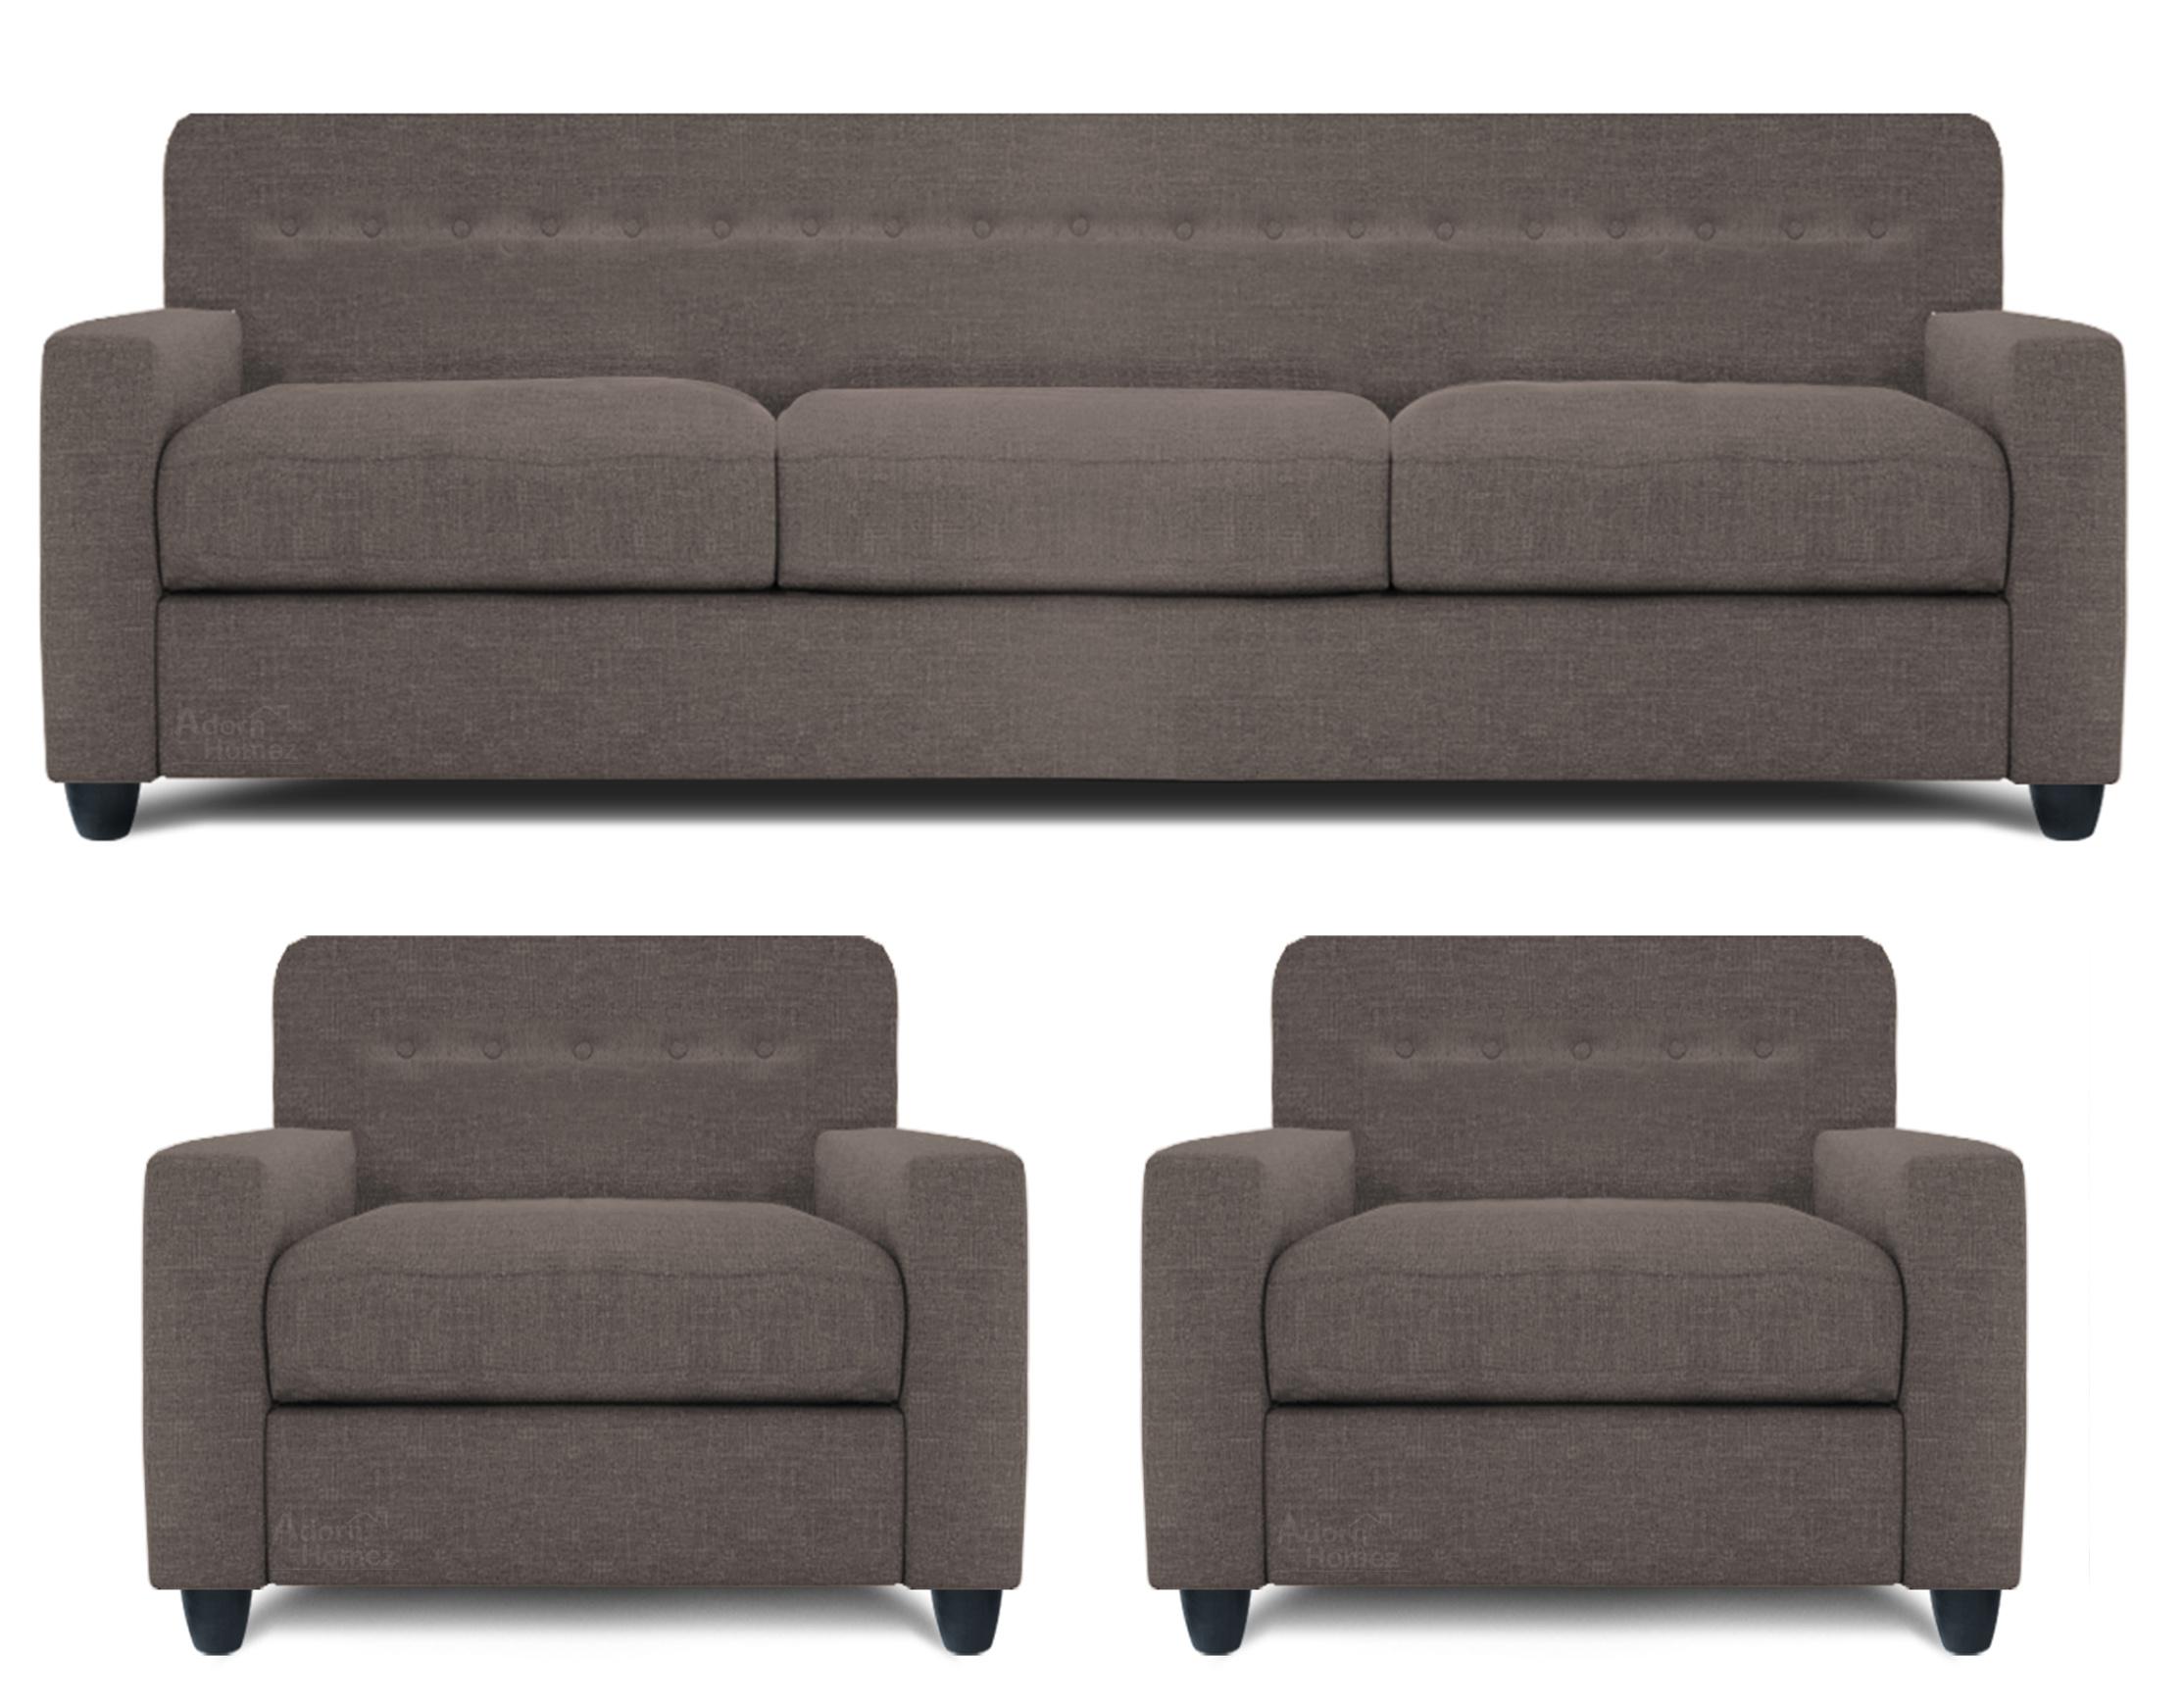 Adorn Homez Solitaire Fabric 3+1+1 Seater Sofa set-Grey